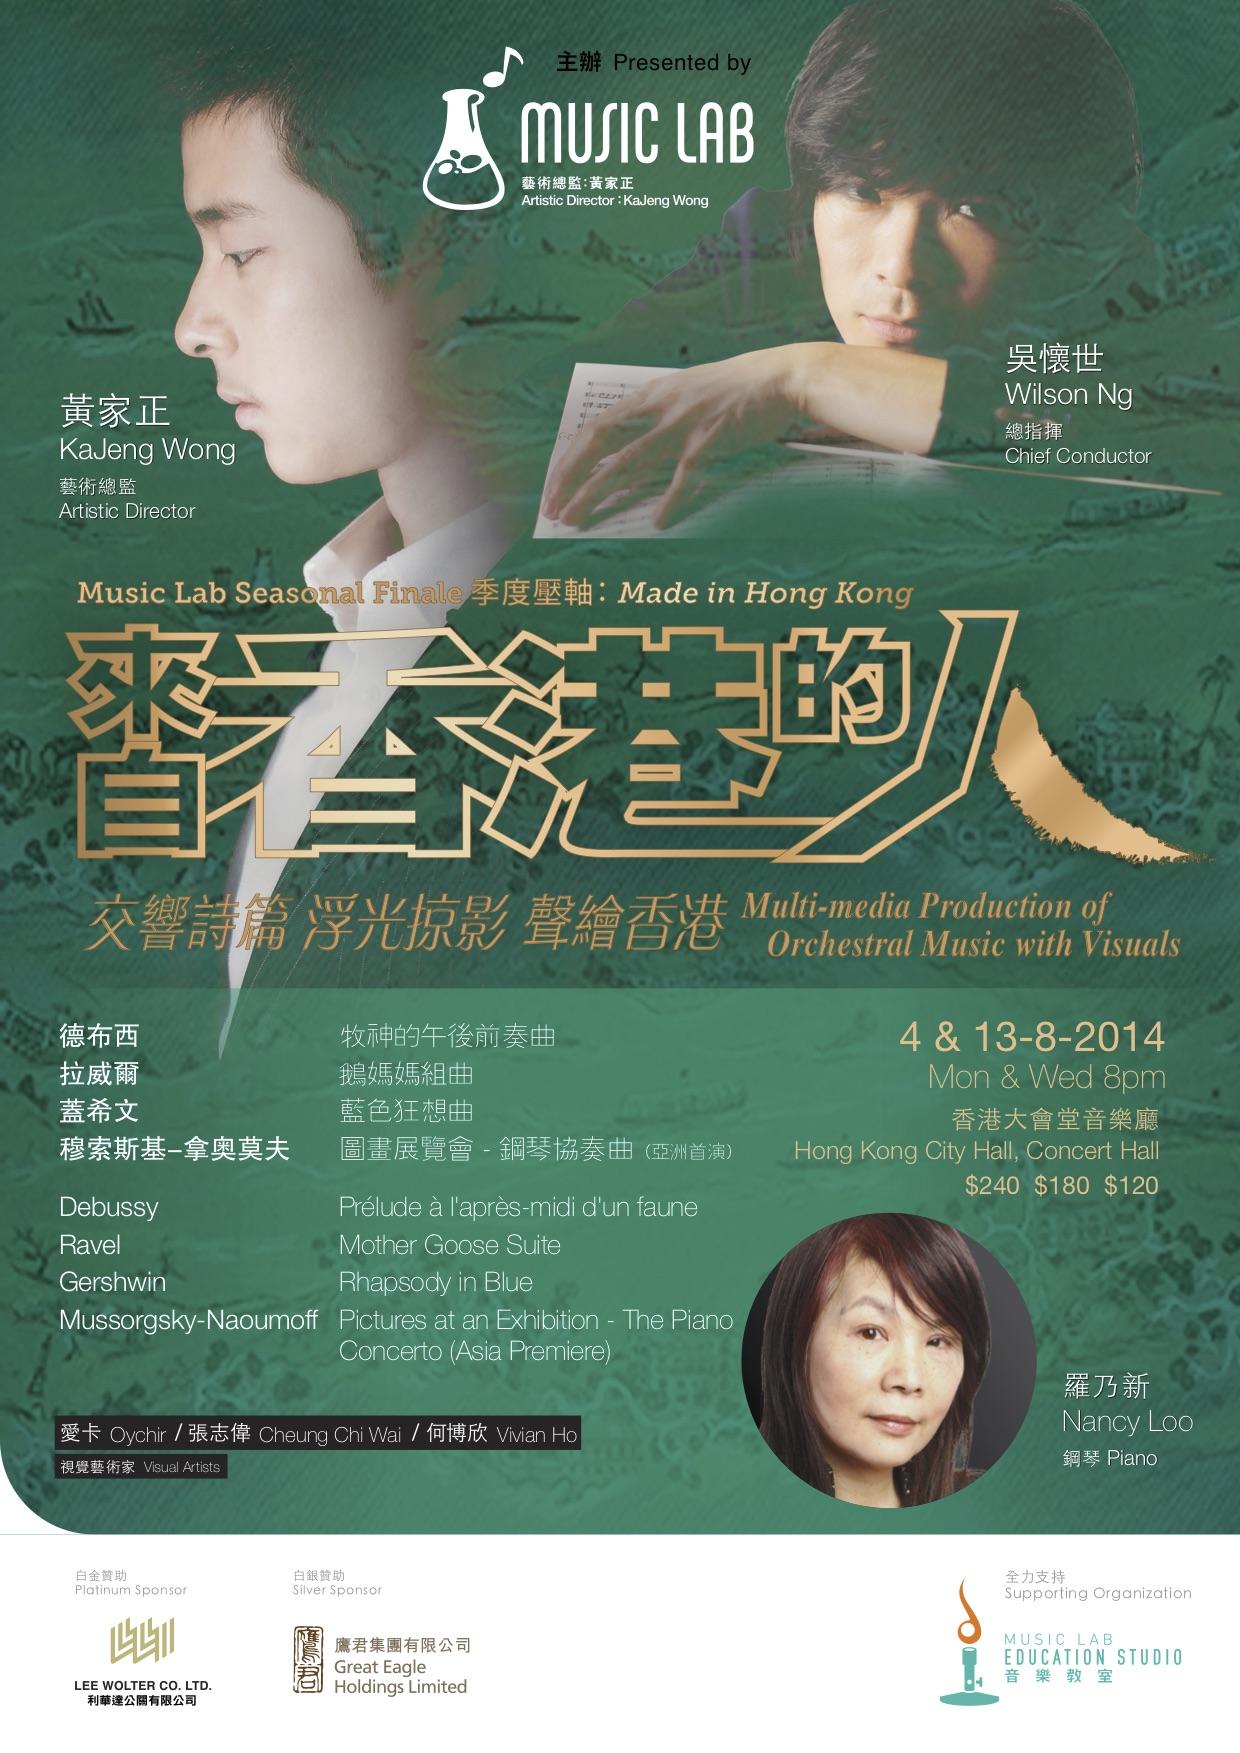 Music Lab 季度壓軸:《來自香港的人》 - Music Lab季度壓軸:《來自香港的人》將揉合管弦樂和不同視覺藝術的元素,透過舞台探索香港的故事和足跡。Music Lab管弦樂團將在指揮吳懷世的帶領下,聯同鋼琴家羅乃新及黃家正演繹數首不同時代的古典名作。音樂亦將與影像結伴同行,同步展出插畫家愛卡、攝影師張志偉及油畫家何博欣的作品,分別敘述和探討香港的歷史發展、被遺忘的小島、甚至香港人的身份認同等議題,以跨媒體的製作方式貫穿整晚的音樂會。節目牧神的午後前奏曲 – 德布西鵝媽媽組曲 – 拉威爾藍色狂想曲 – 蓋希文圖畫展覽會 – 鋼琴協奏曲 (亞洲首演) – 穆索斯基–拿奧莫夫